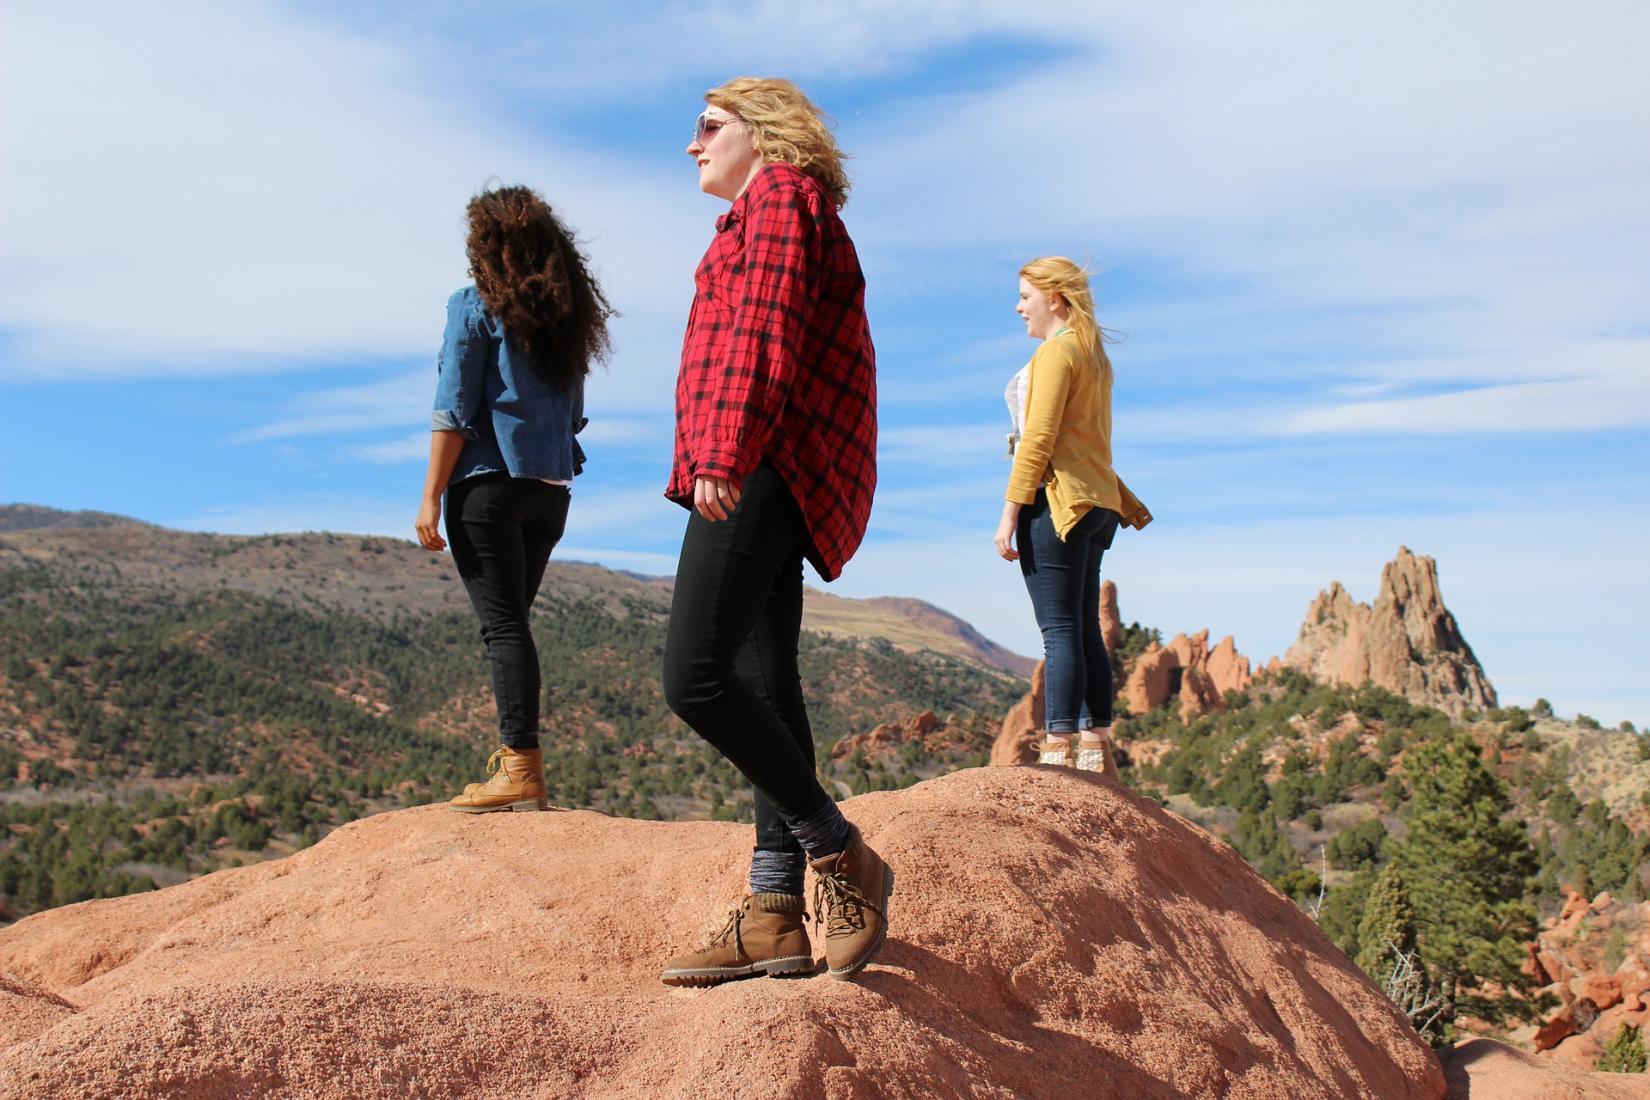 Girls on adventure